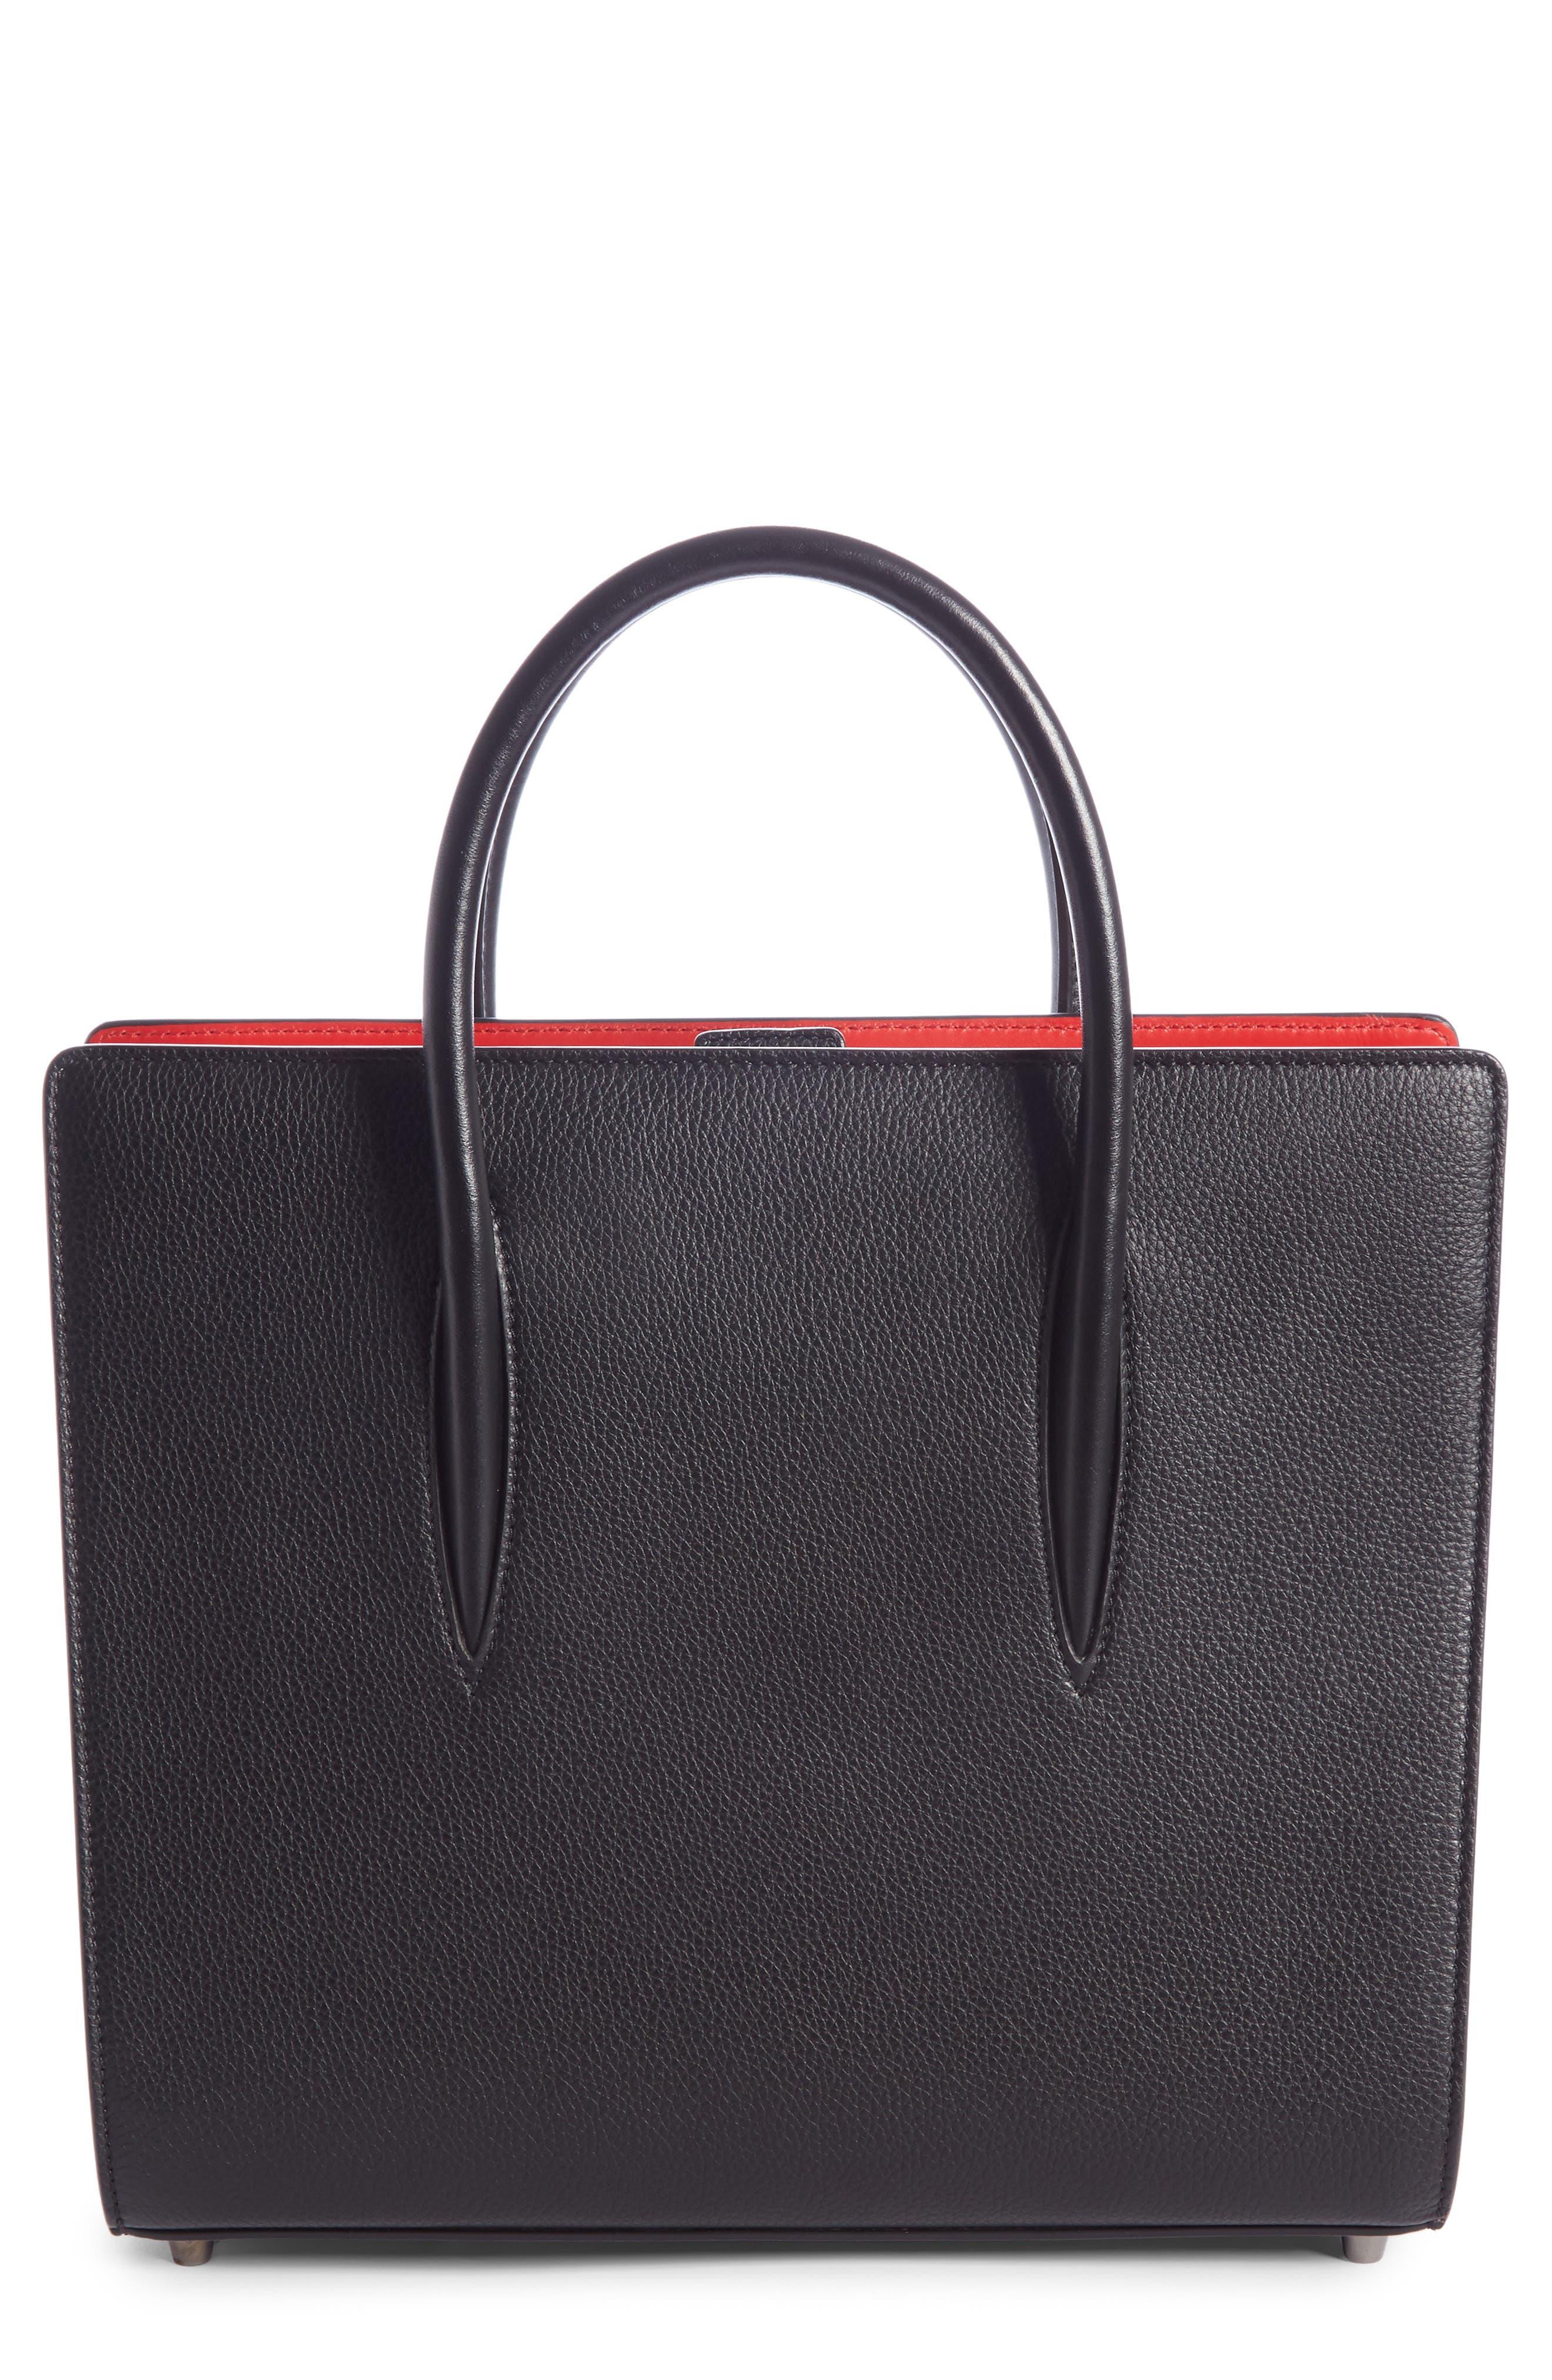 c0181c5b20c Buy christian louboutin totes & satchels for women - Best women's ...